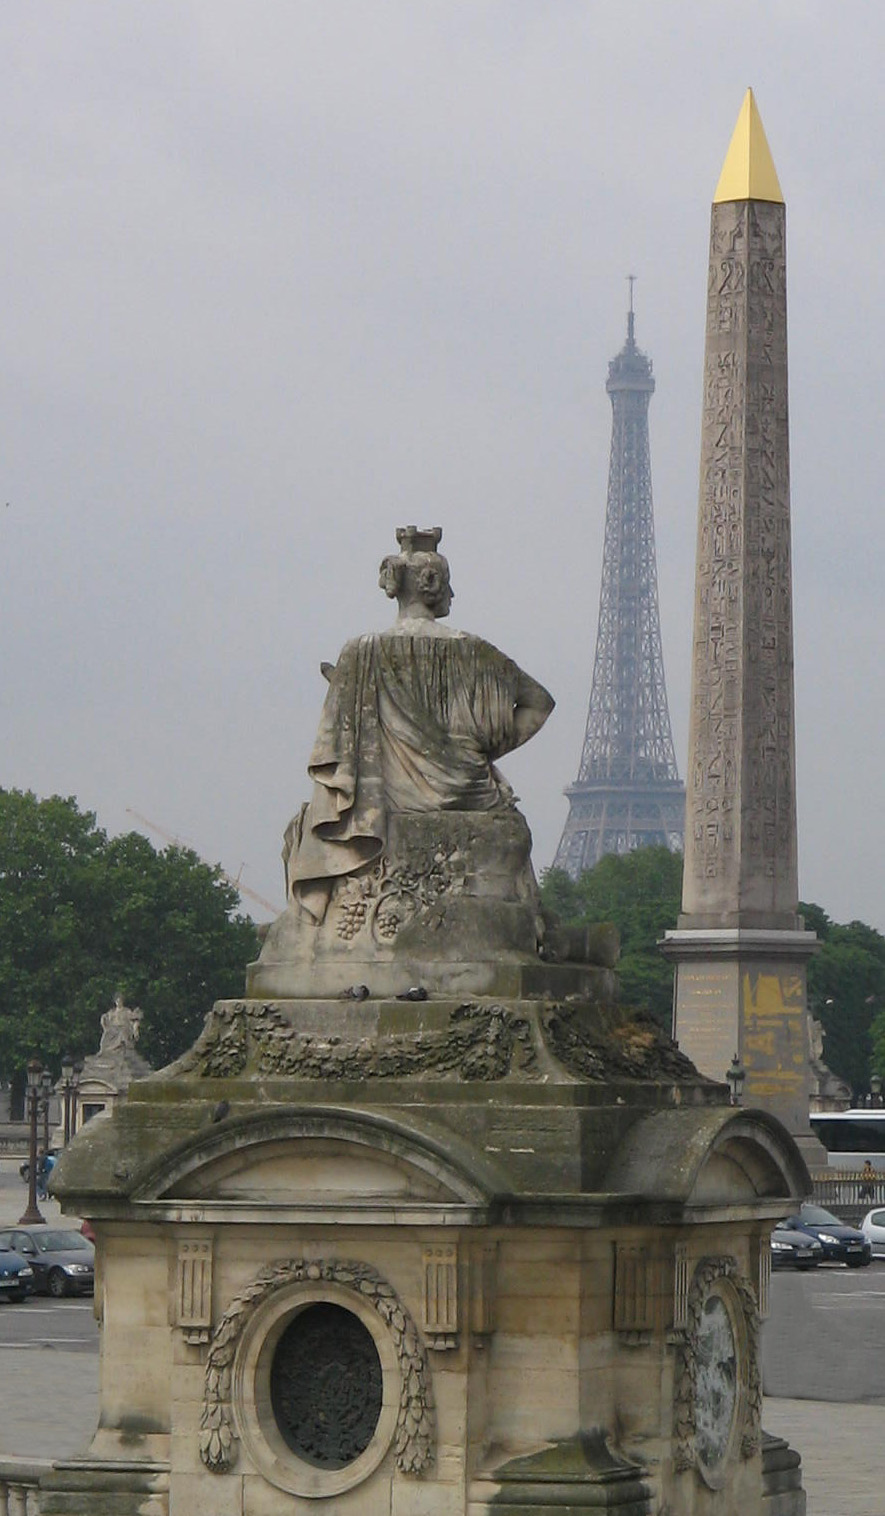 http://upload.wikimedia.org/wikipedia/commons/4/47/Place_de_la_Concorde_Paris_091.jpg